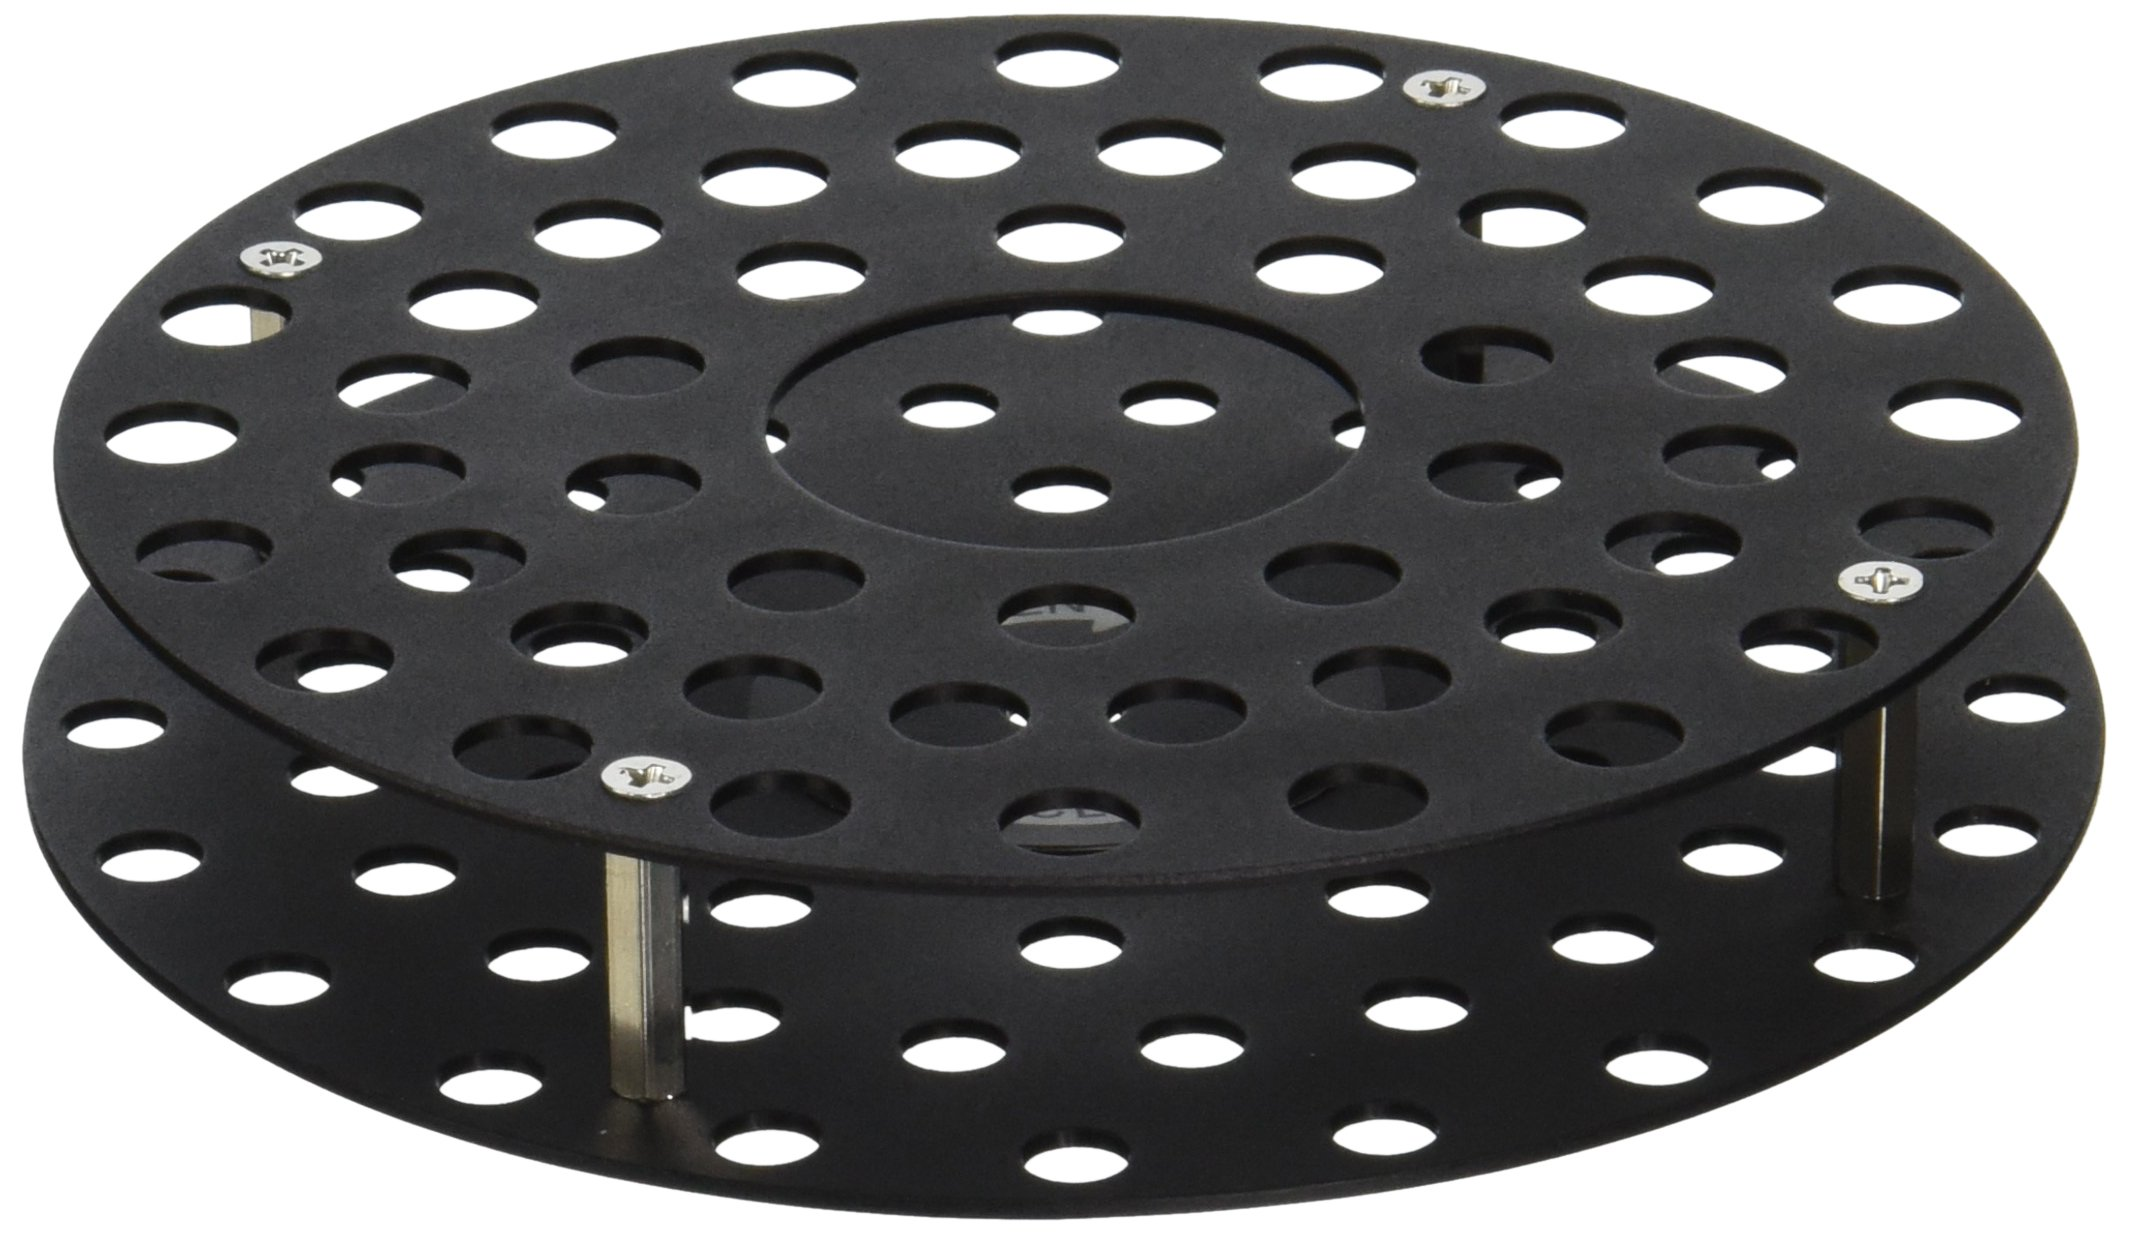 Labconco 7548400 PTFE-Coated Aluminum Microcentrifuge Tubes Fixed-Angle Rotor, Holds 24 x 0.5ml Microcentrifuge Tubes